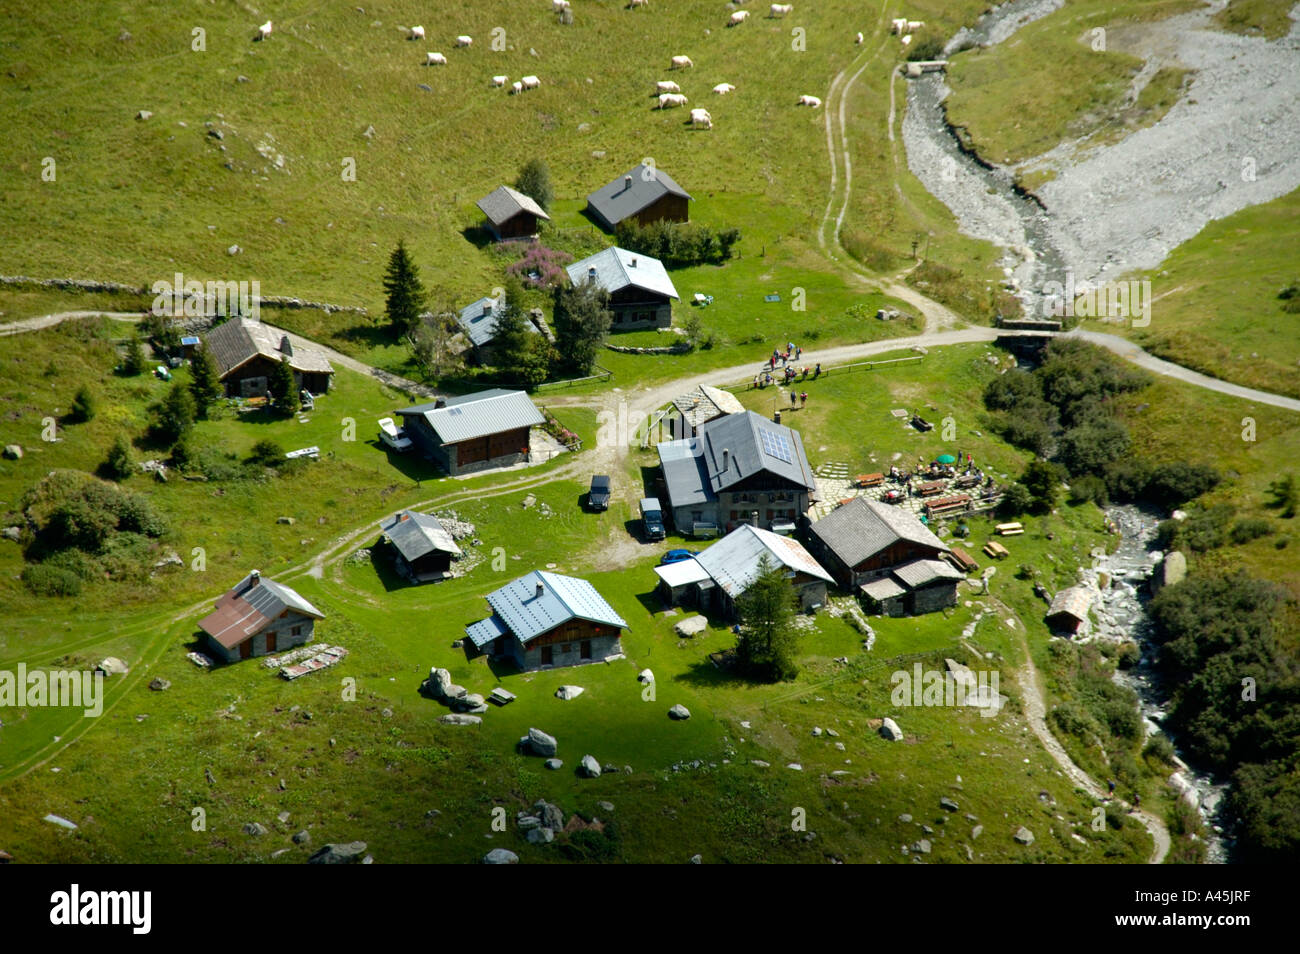 View onto the huts of the alp Chalets de Miage Haute-Savoie France - Stock Image